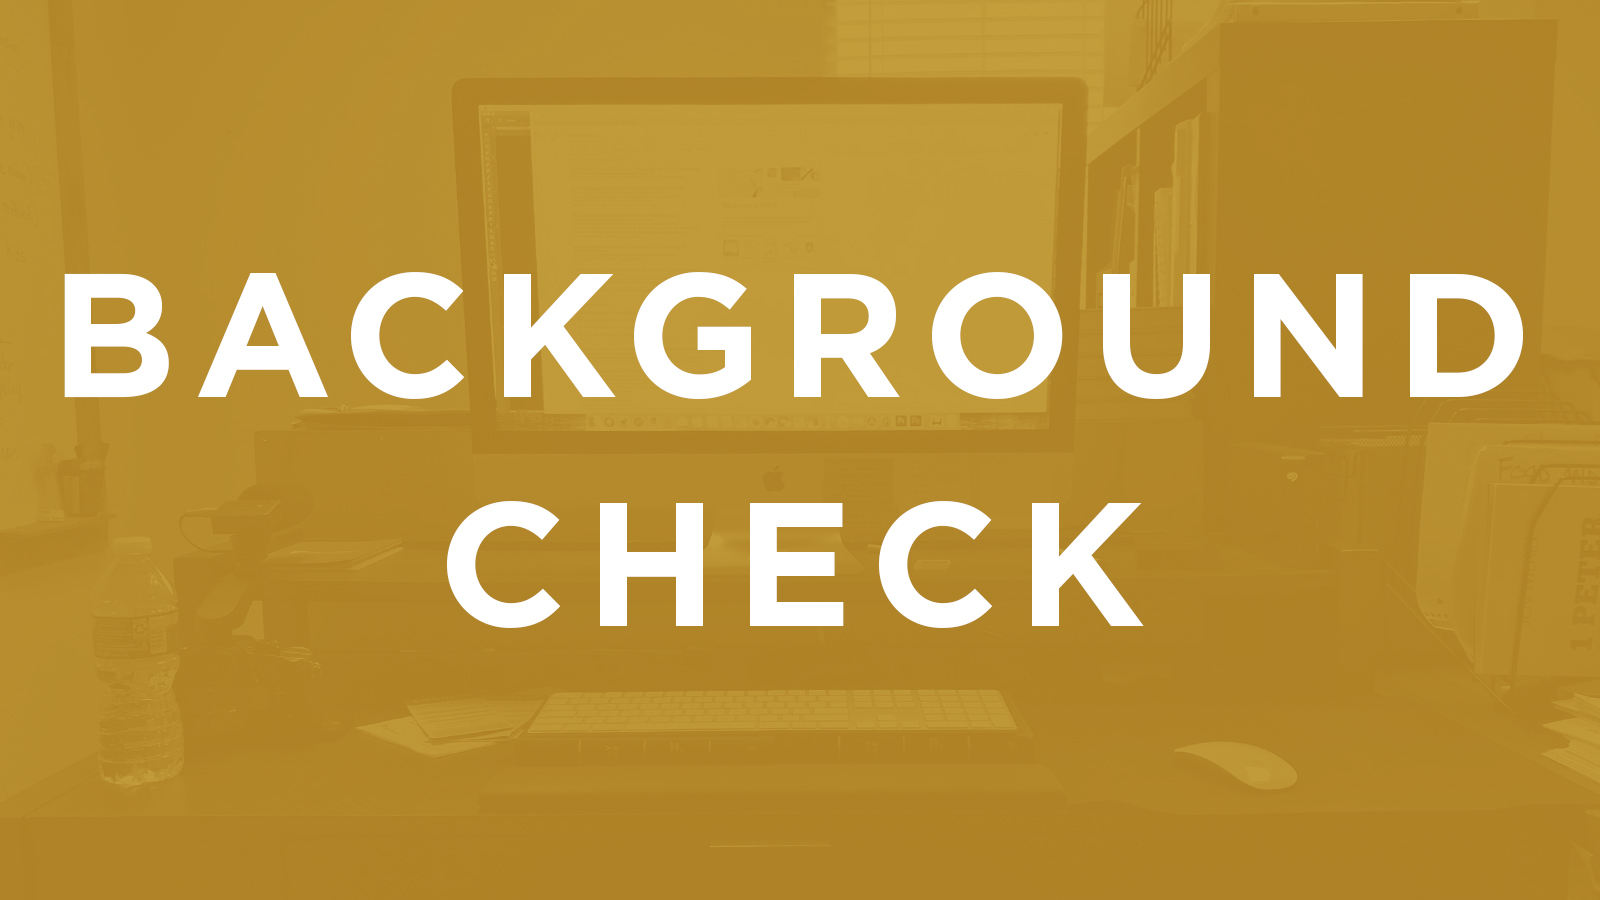 BackgroundCheck.jpg